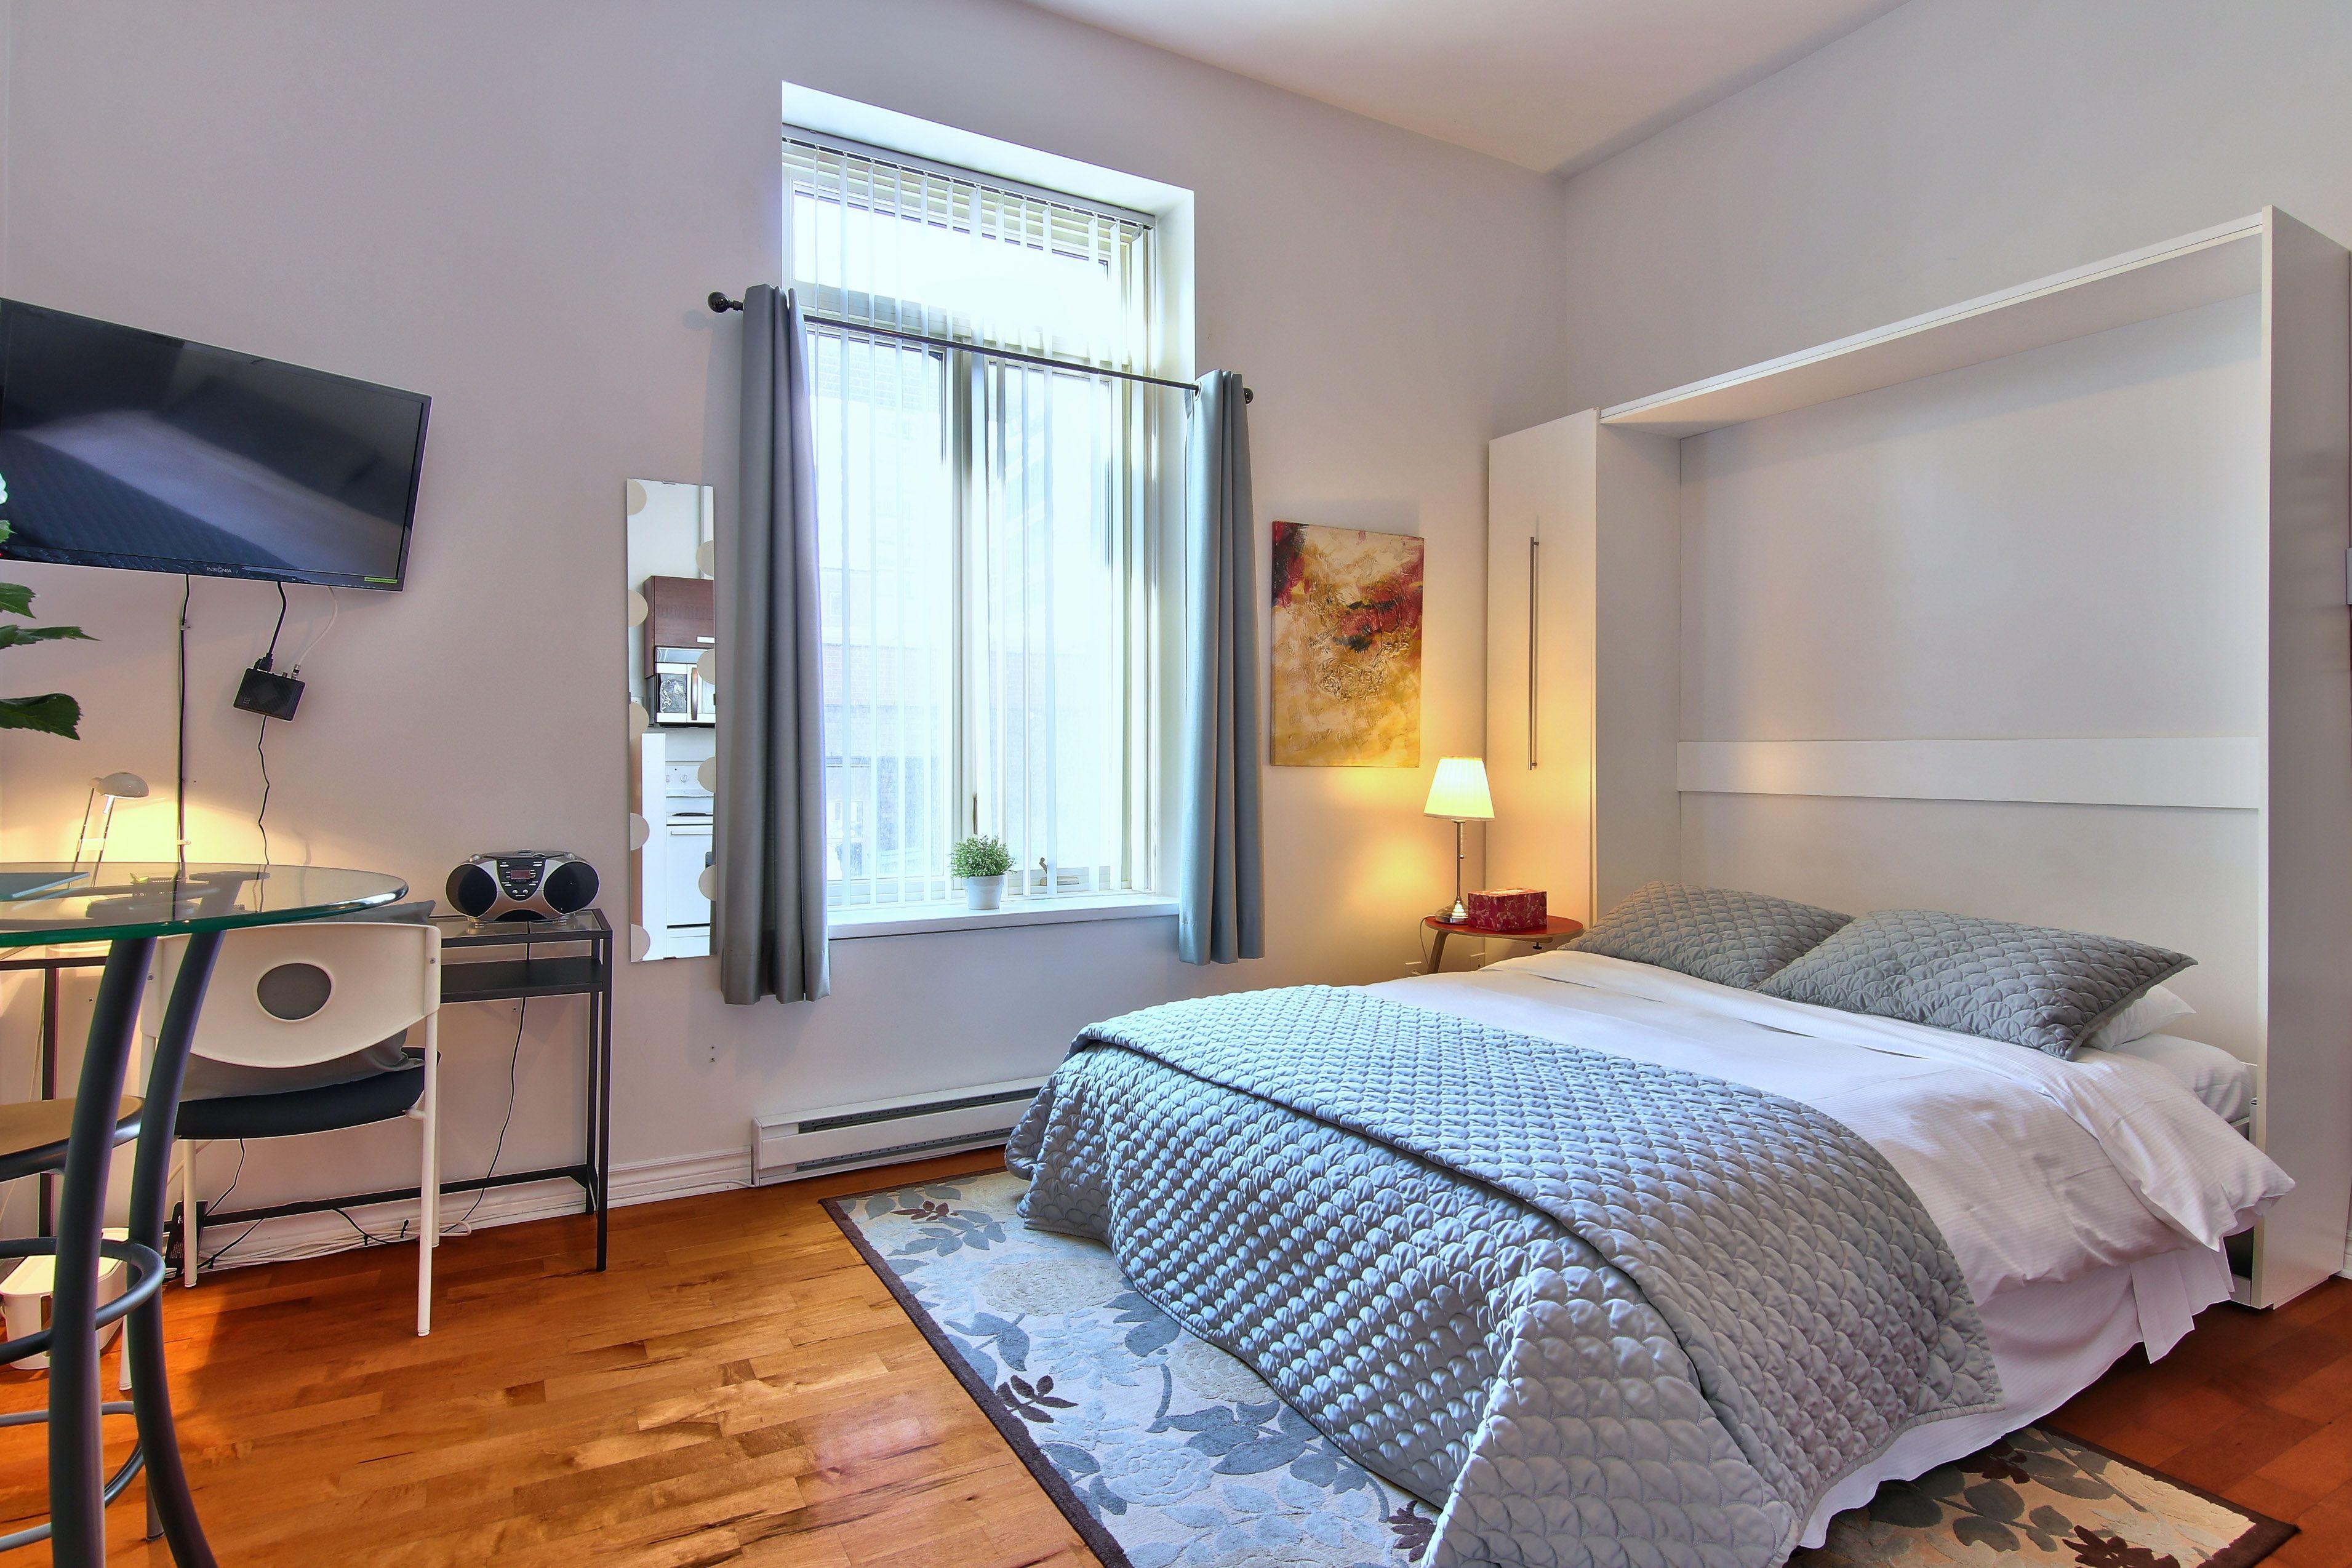 hotel-proche-palais-des-congres-montreal-studio-chambre-lit-queen